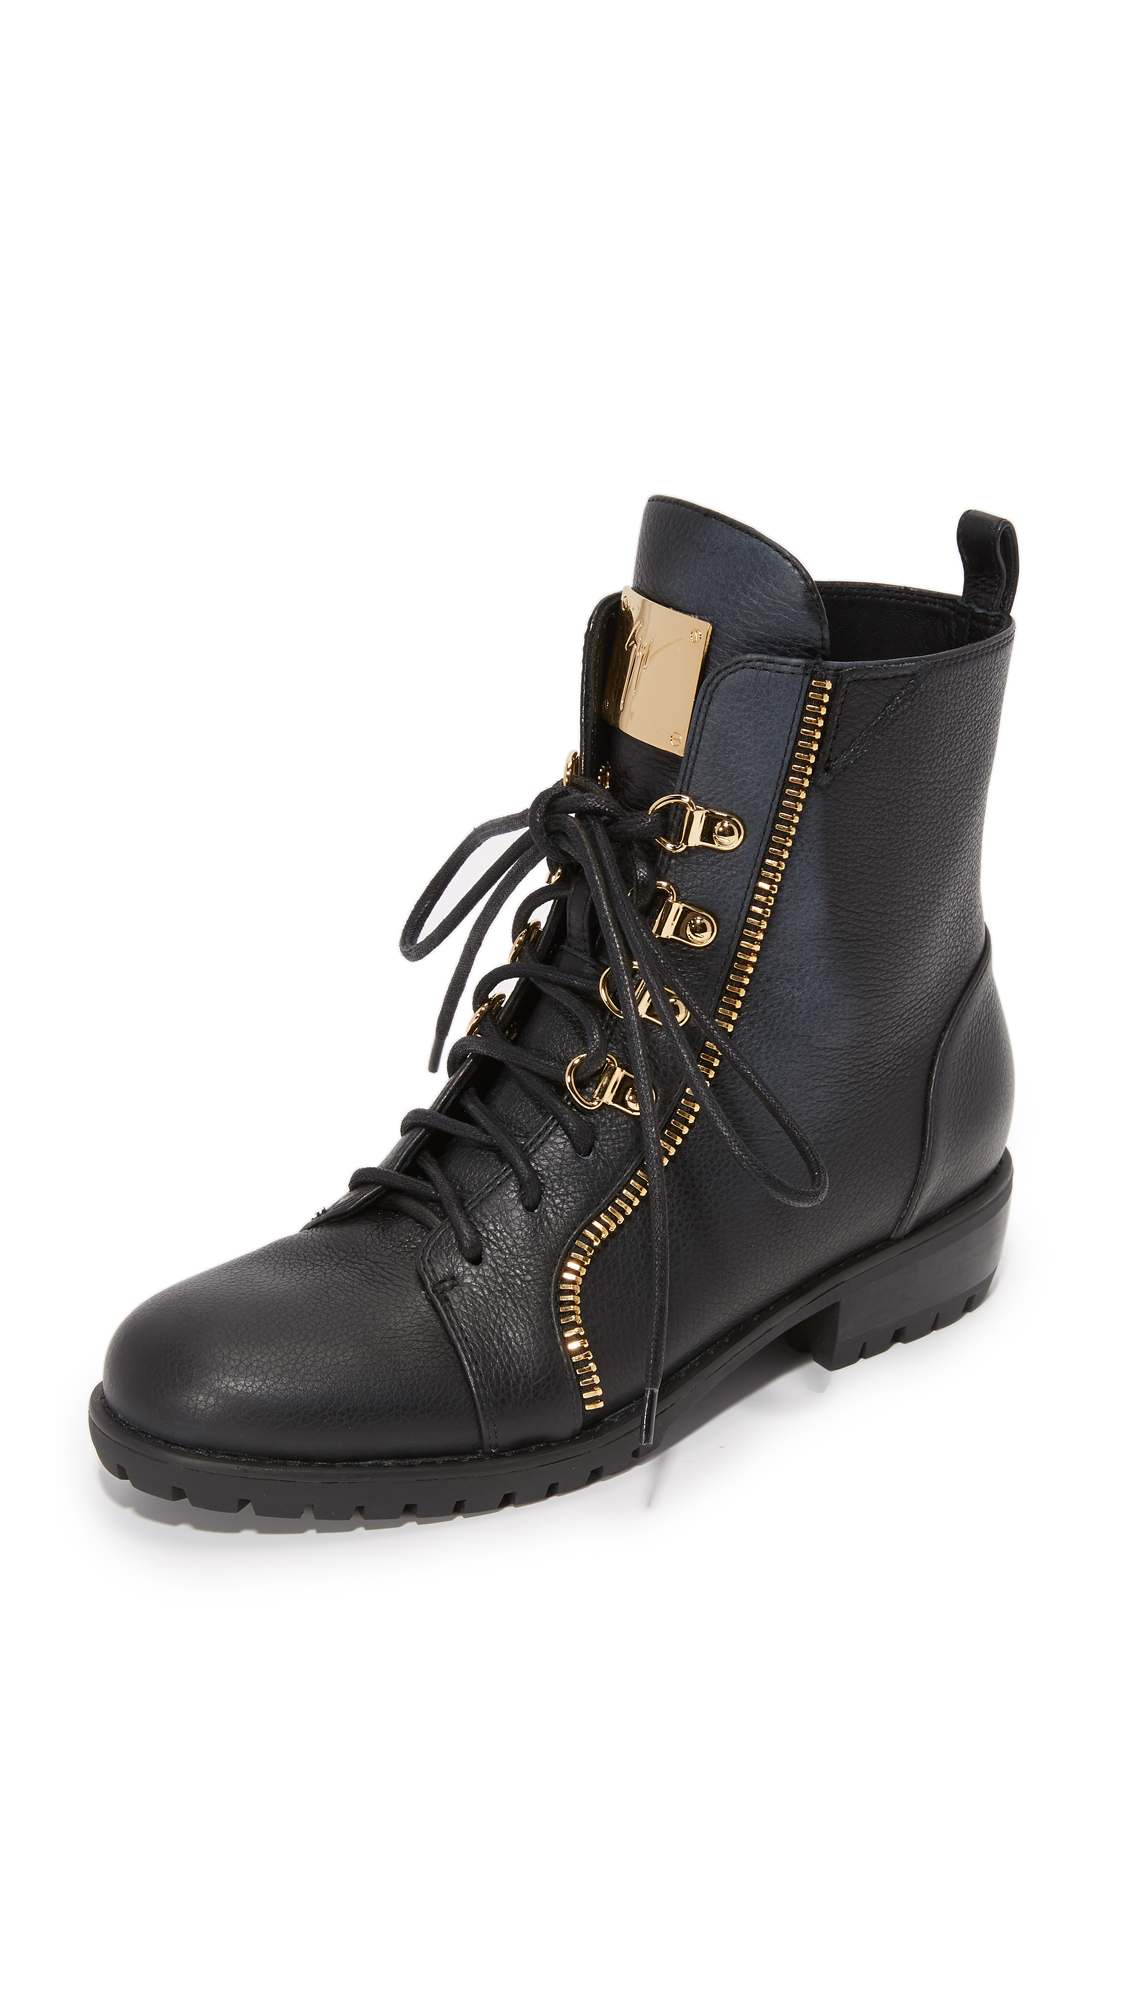 Giuseppe Zanotti Leather Combat Boots - Black at Shopbop